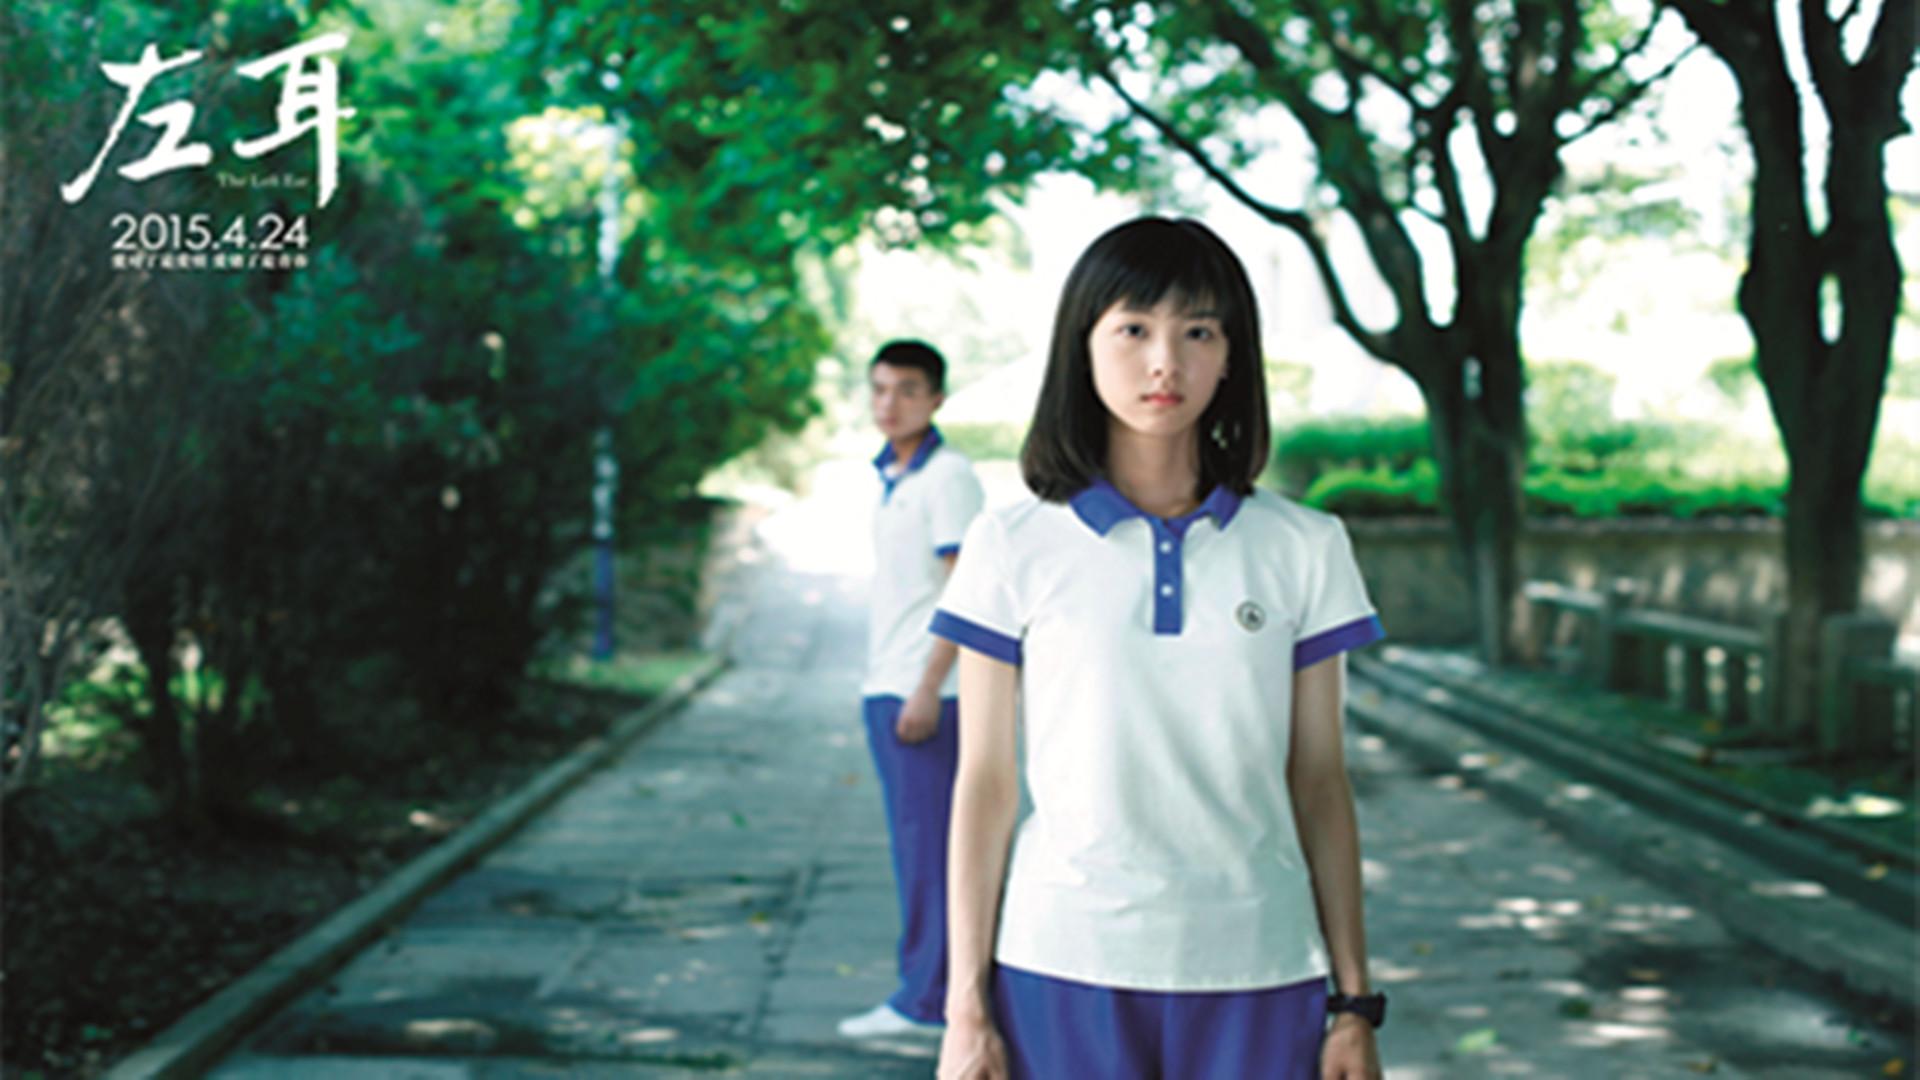 <b>七部的好看的青春校园电影,哪一部电影勾起了你的回忆?</b>